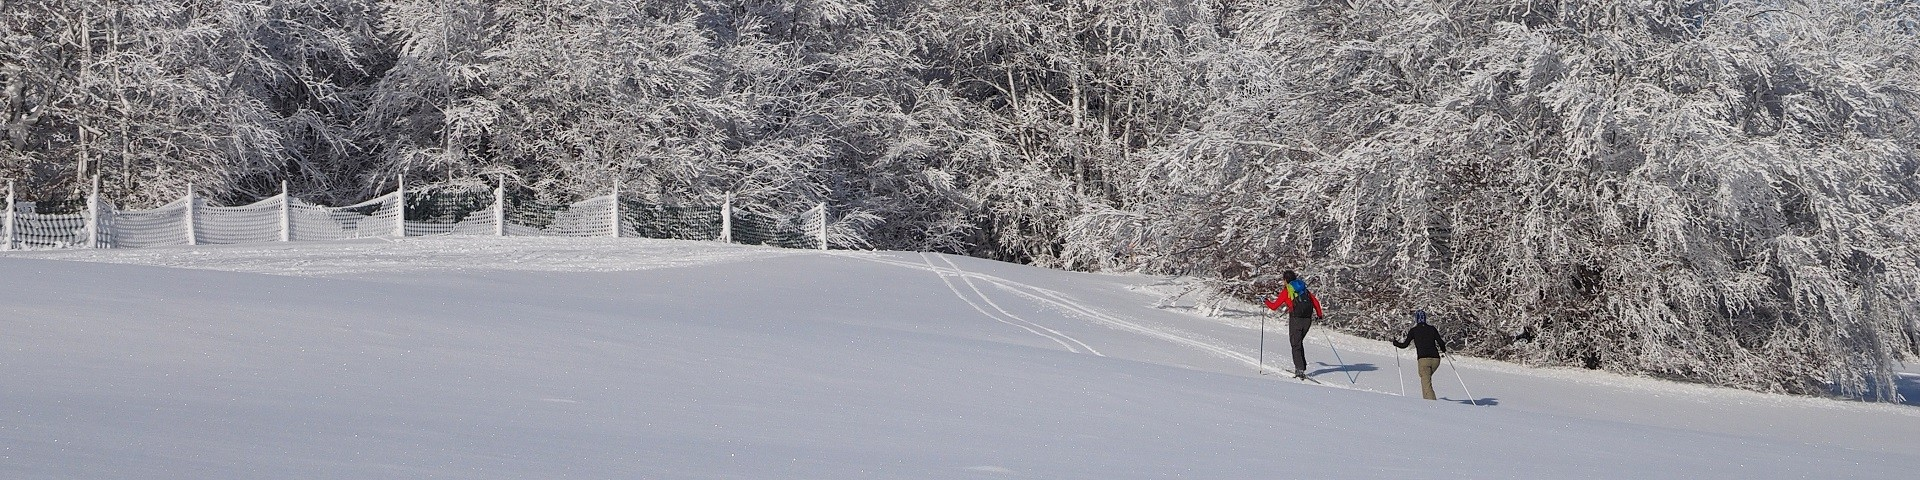 neige209-001-dominique-steinel-jpg-ski-de-fond-2133